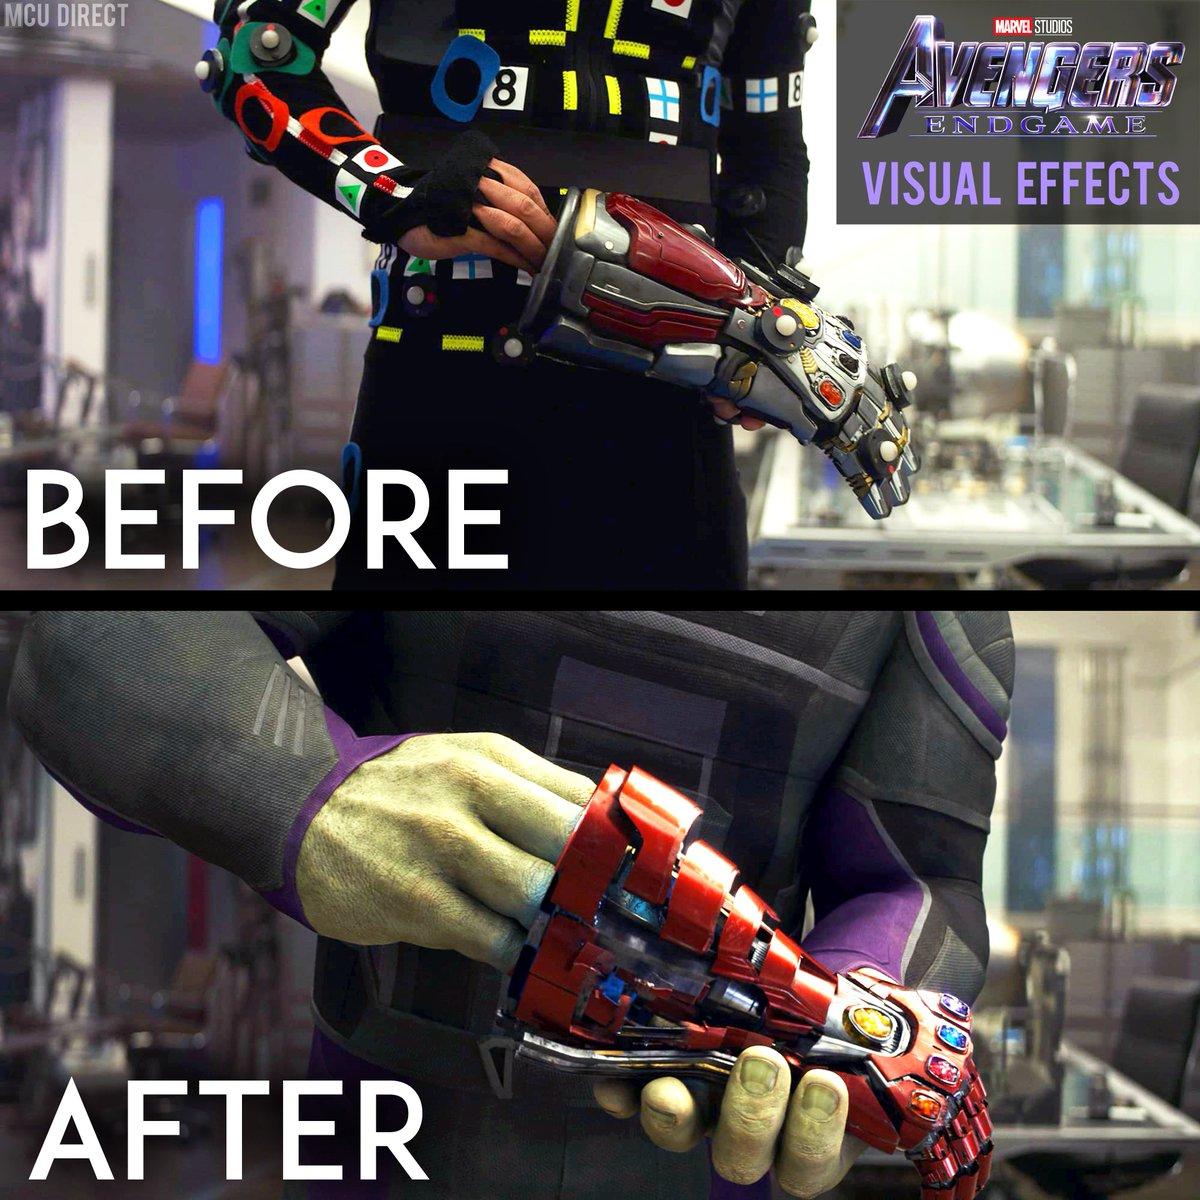 Wielding the Iron Gauntlet... #AvengersEndgame  <br>http://pic.twitter.com/kxz0m6g6zz